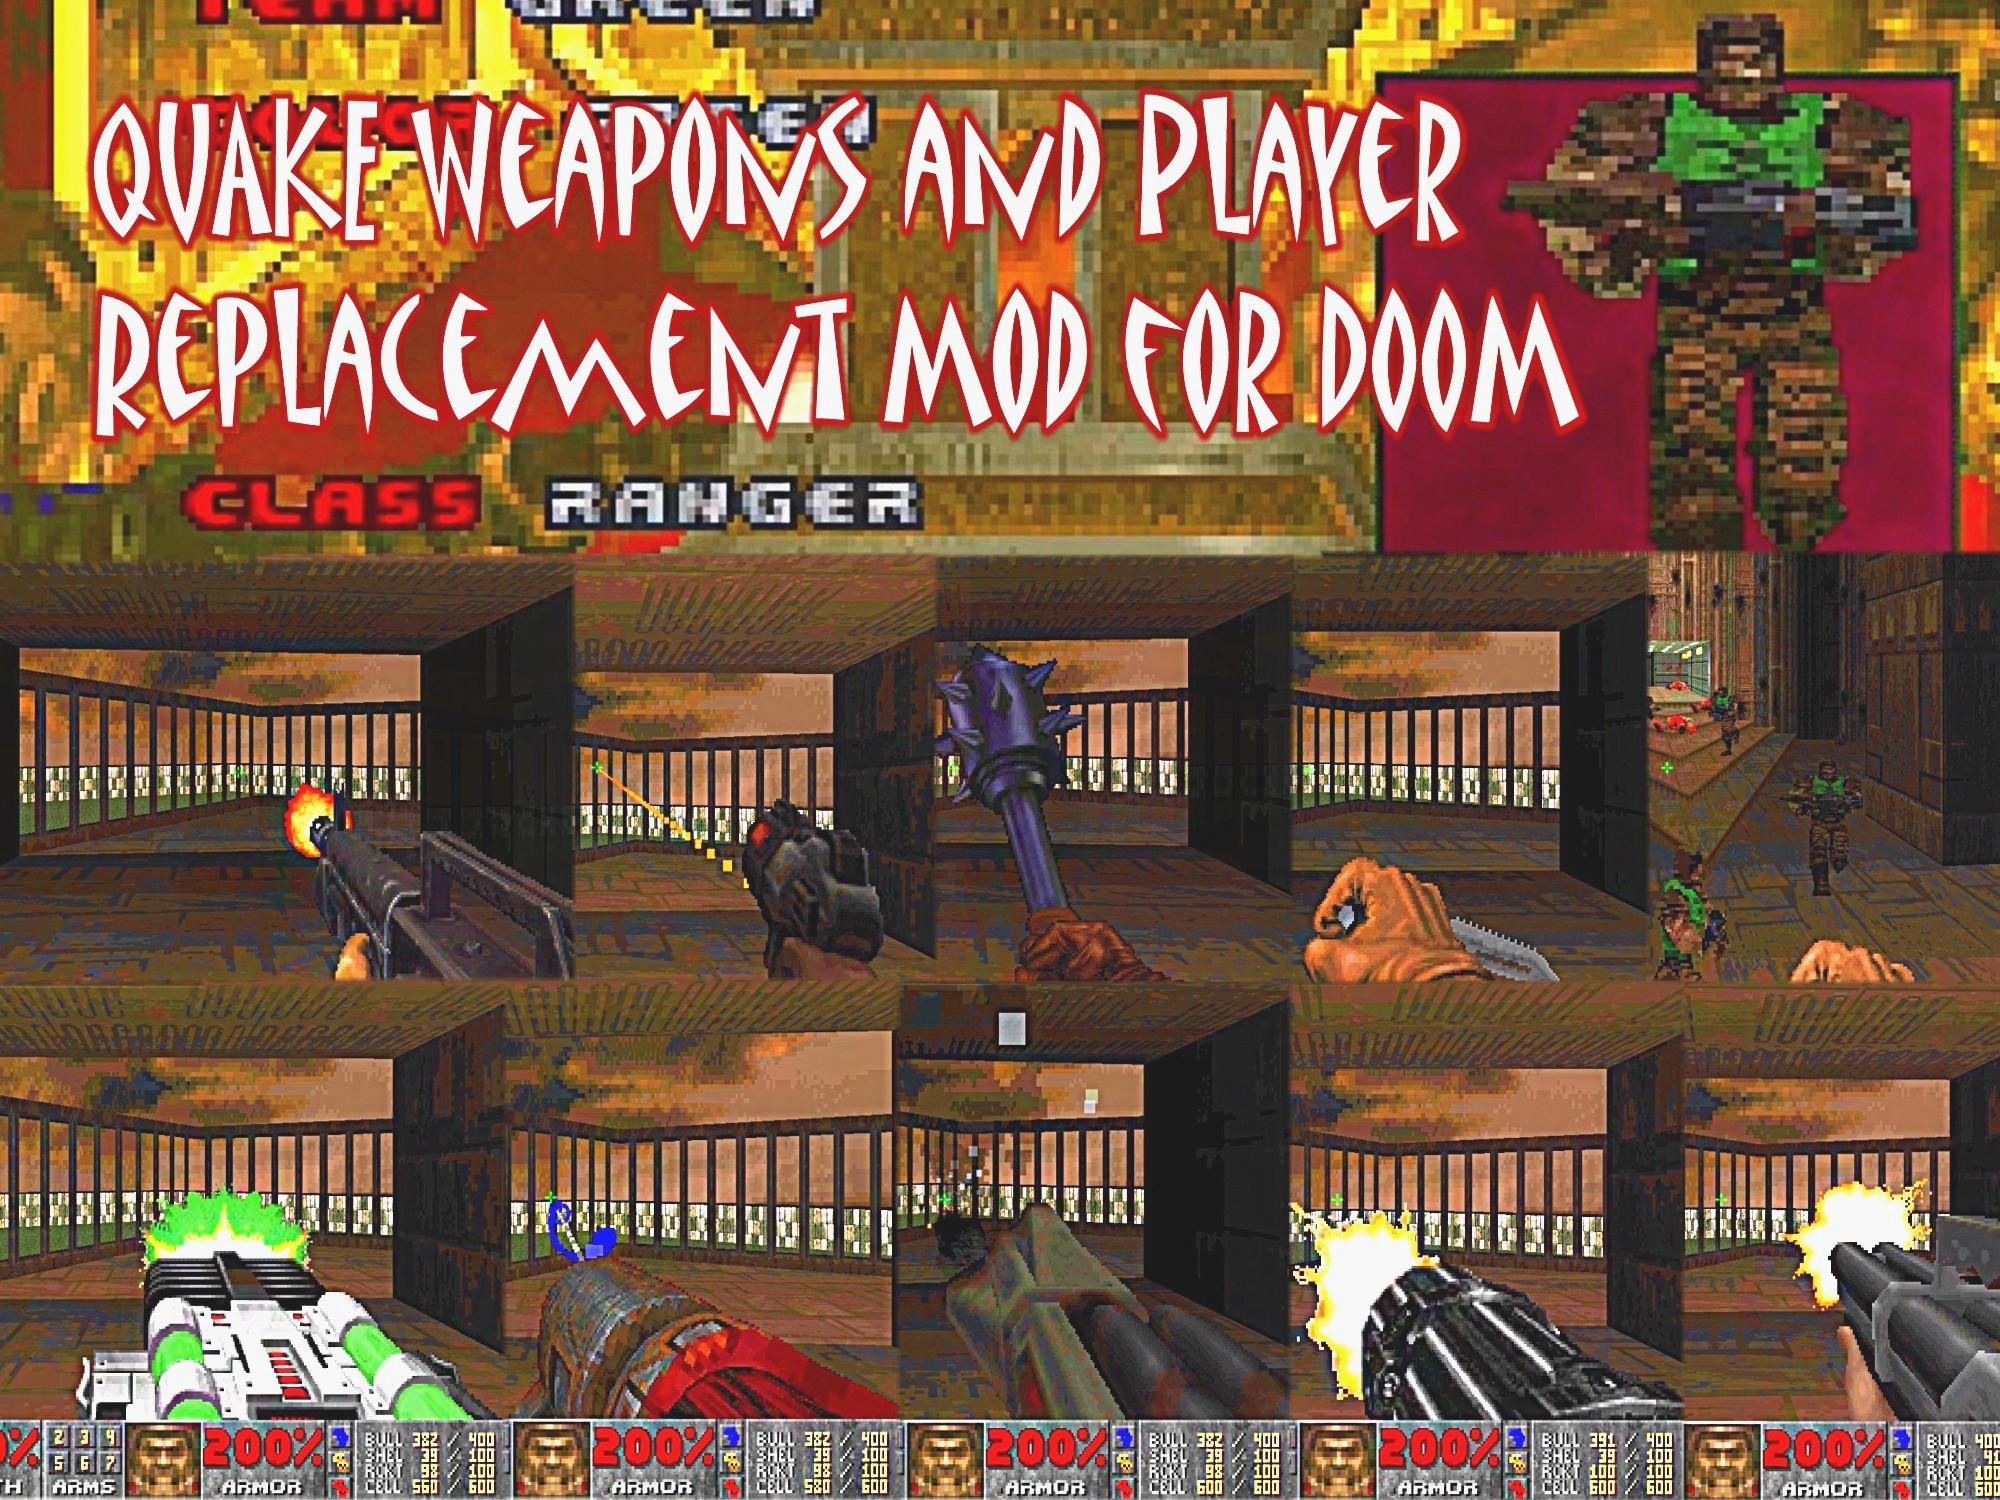 Download Doom 3 Weapons Mod Doom 2 Wad - crisesocialmedia